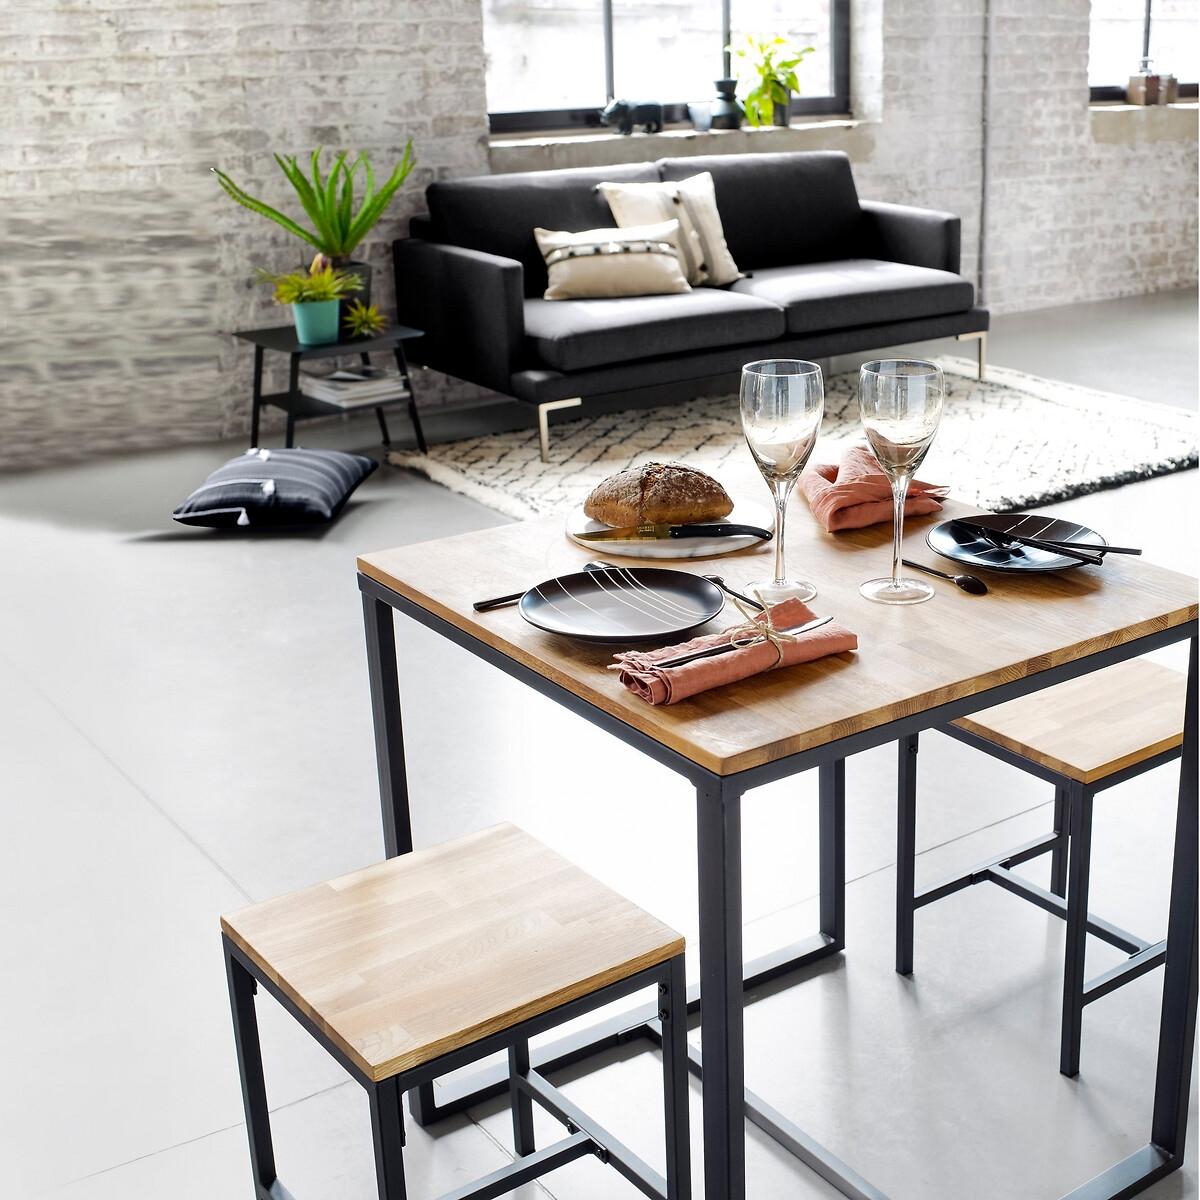 Table bistrot 2 couverts chêne et acier, Hiba